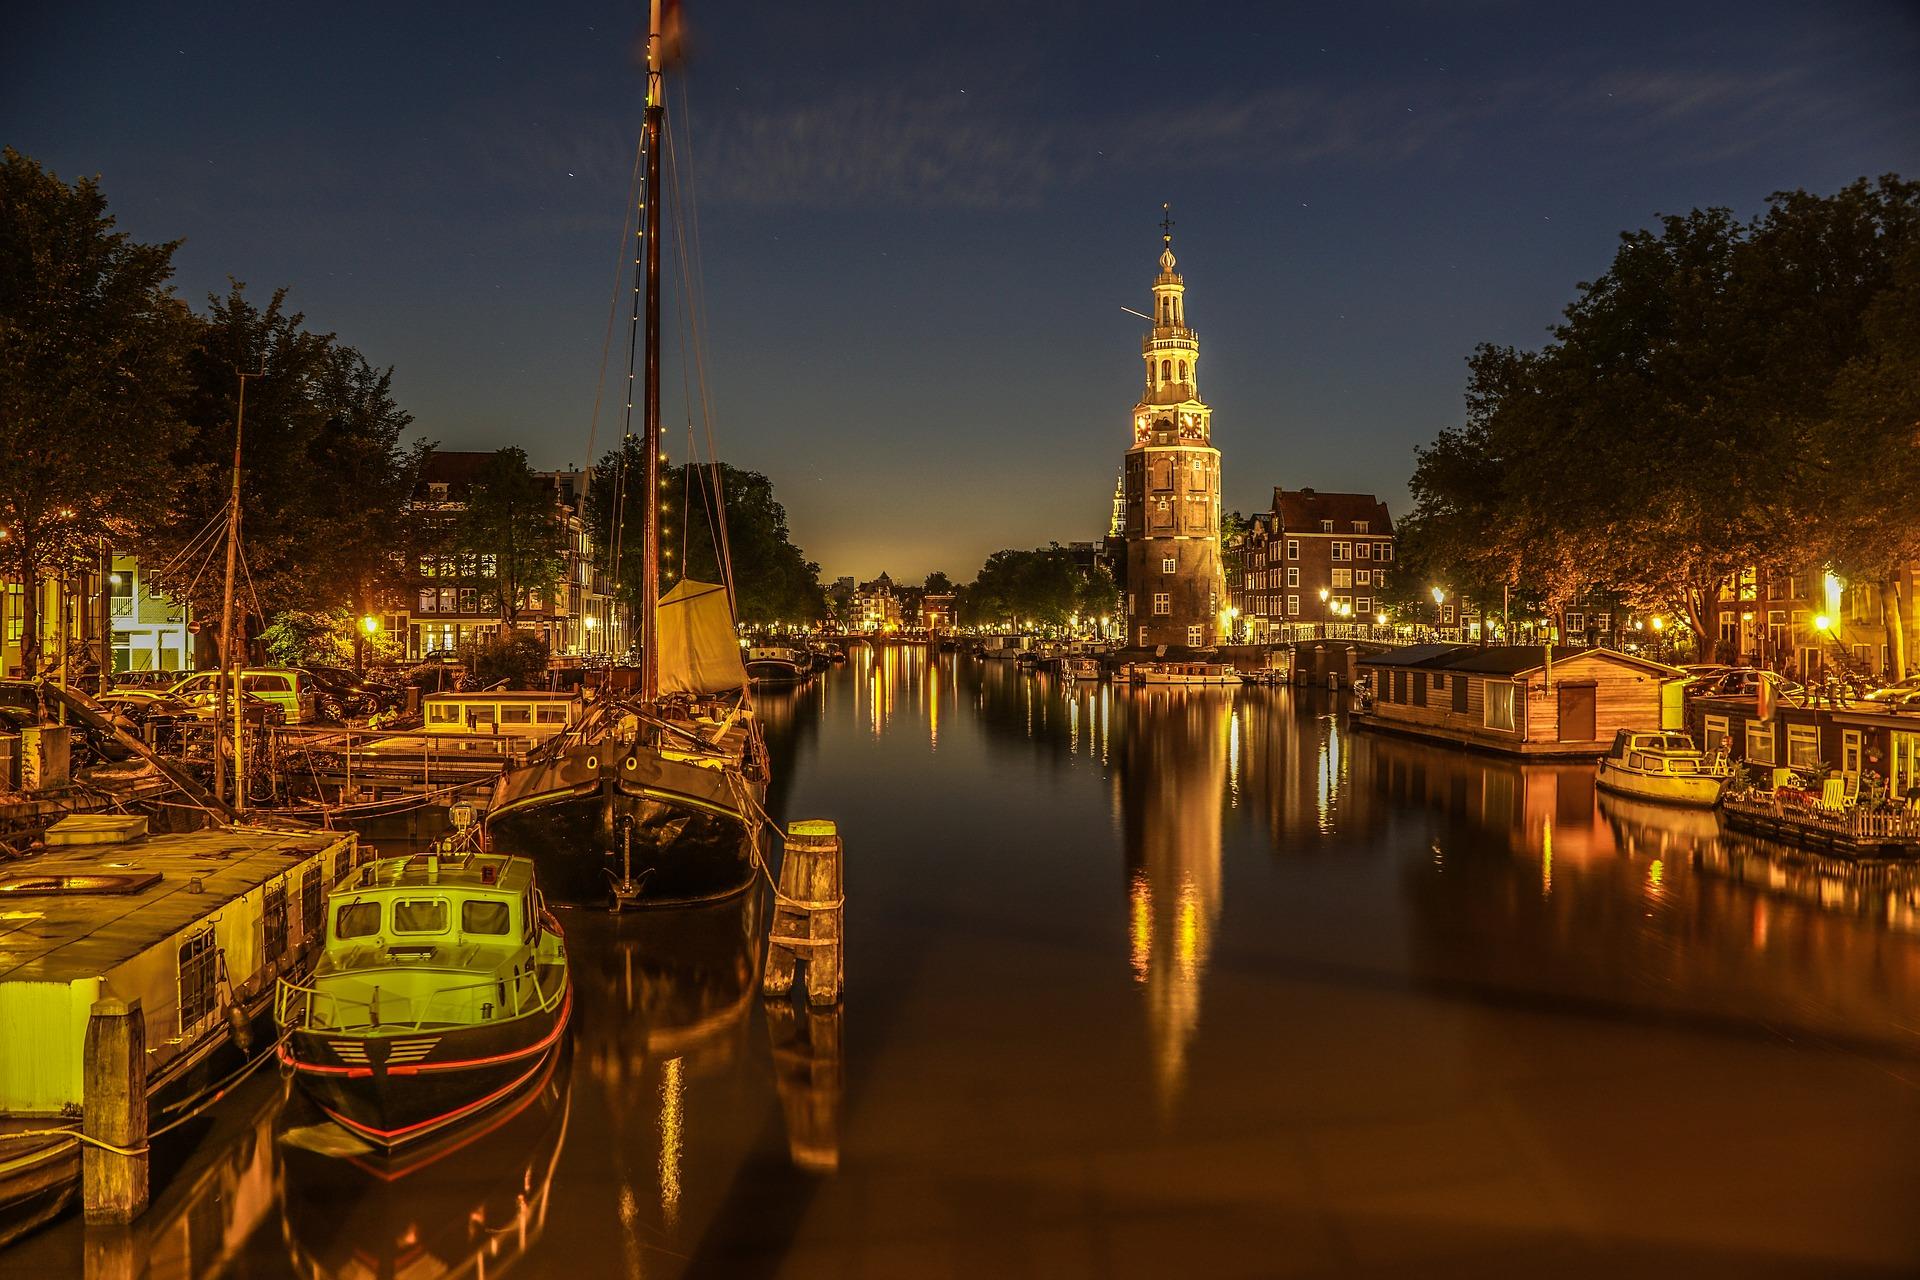 9. Amsterdam, The Netherlands -